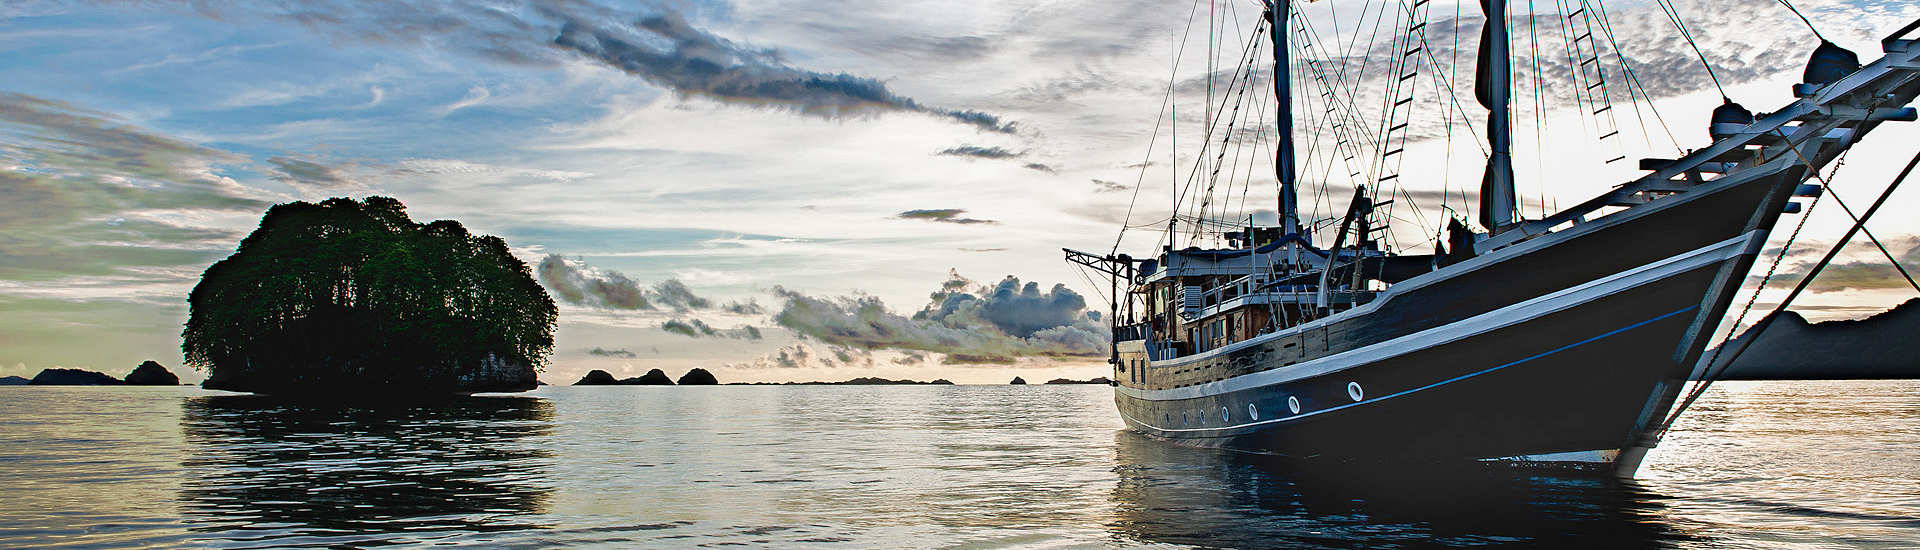 Tauchsafaris in West Papua & Raja Ampat – Seahorse